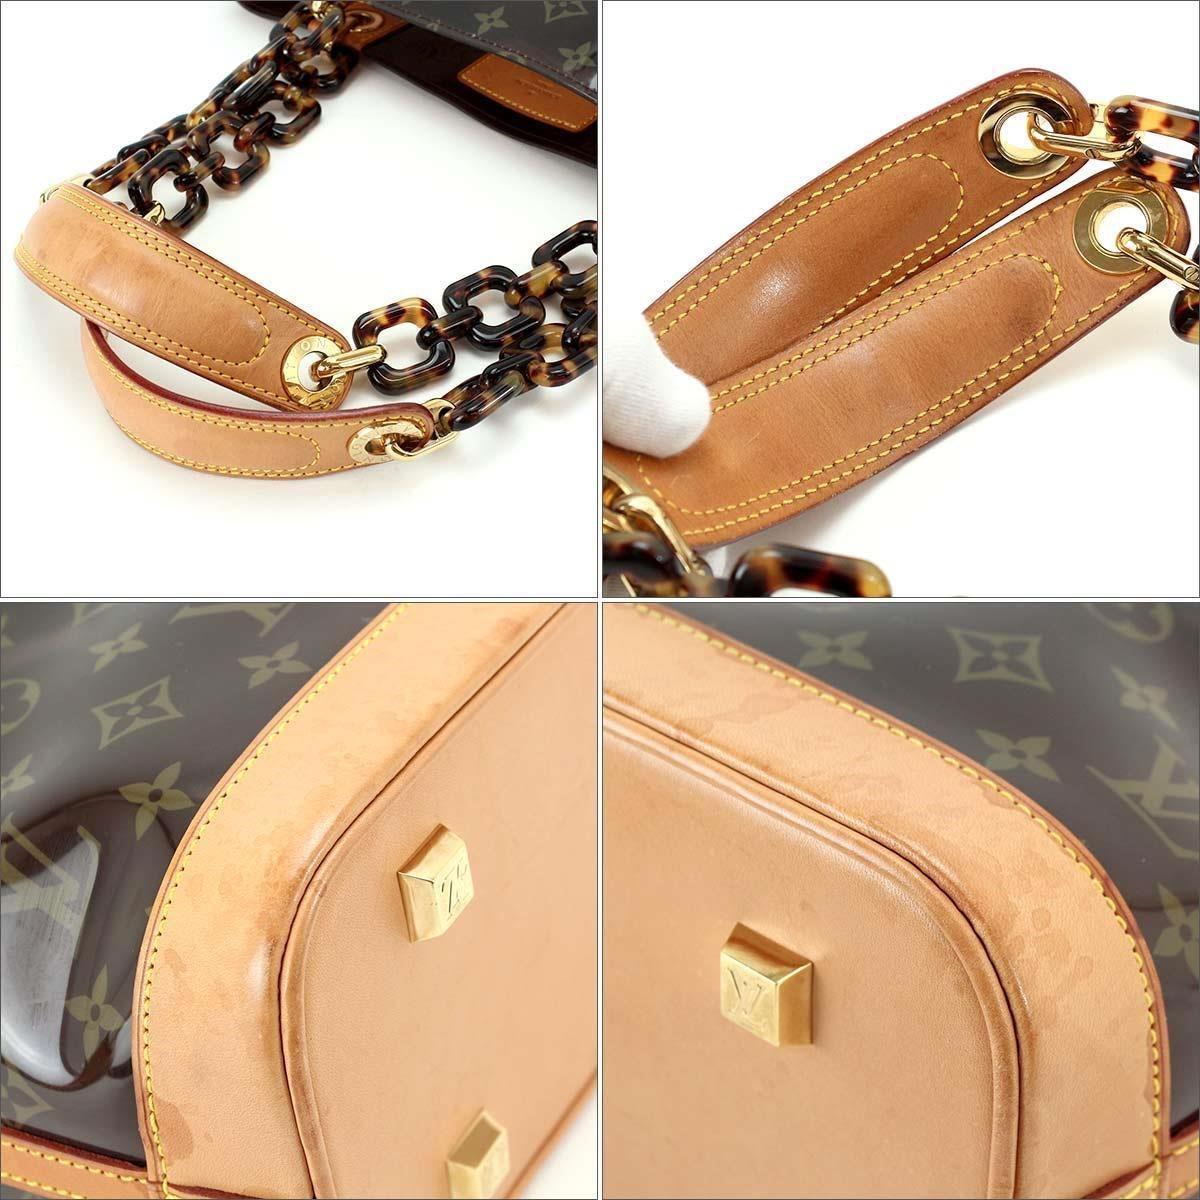 b6046b55f2bd Lyst - Louis Vuitton Monogram Cabas Ambre Mm Tote Bag Vinyl Brown ...